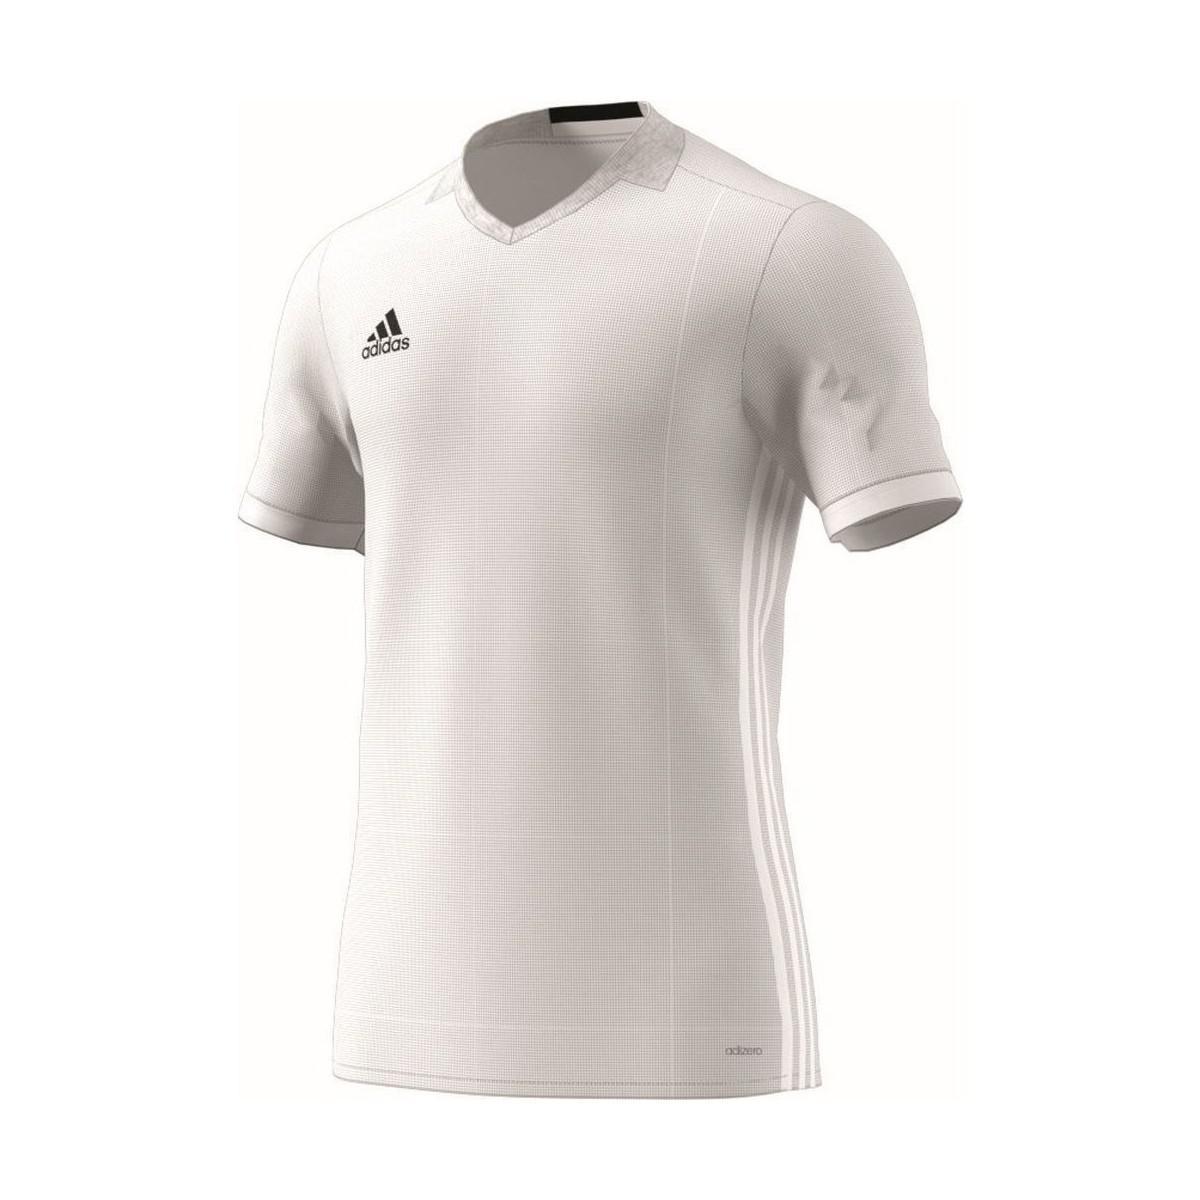 df33e44ac Adidas Condivo 16 Trikot Weiï Men s T Shirt In Multicolour for Men ...